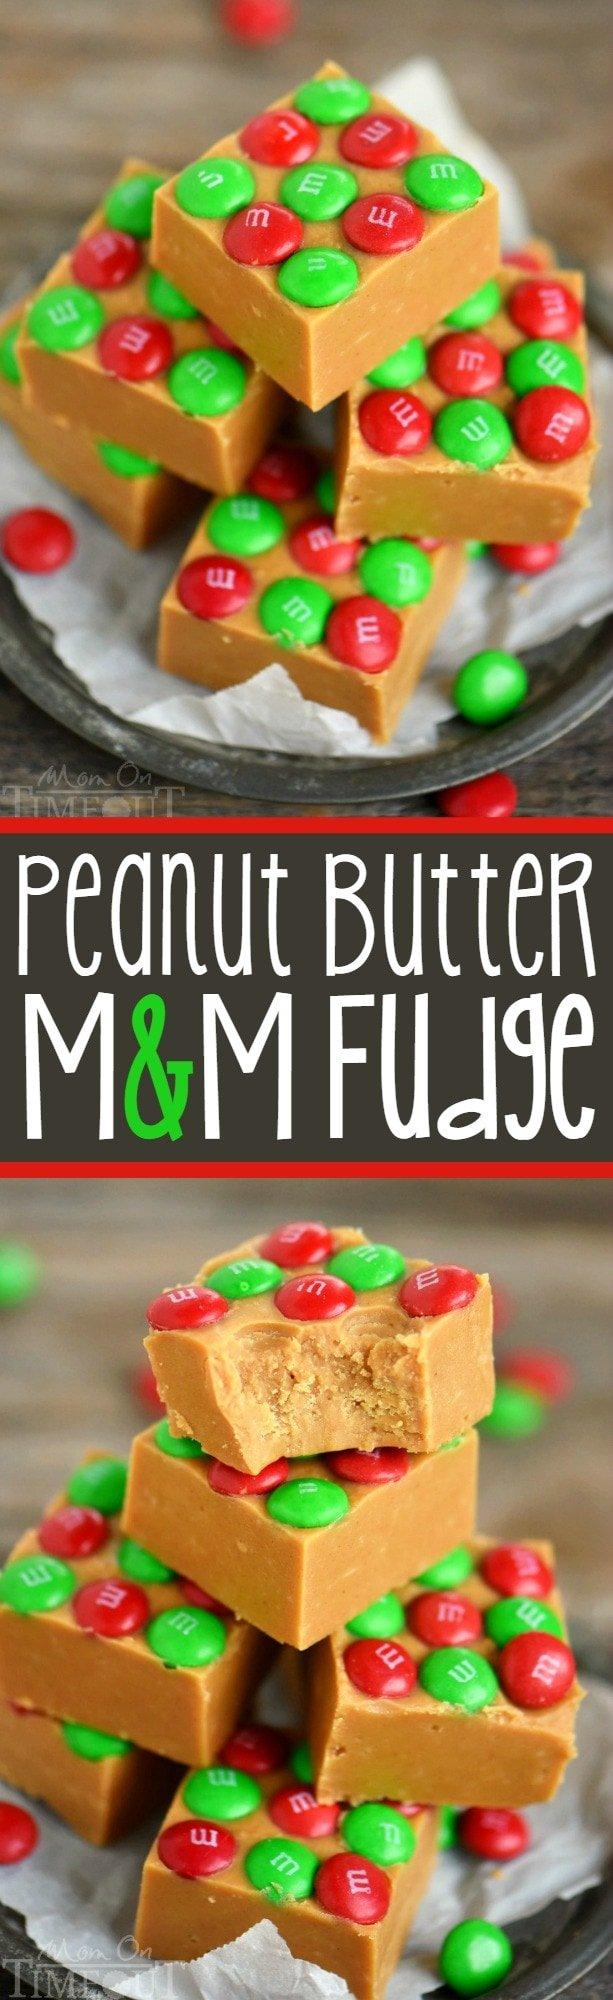 peanut-butter-fudge-recipe